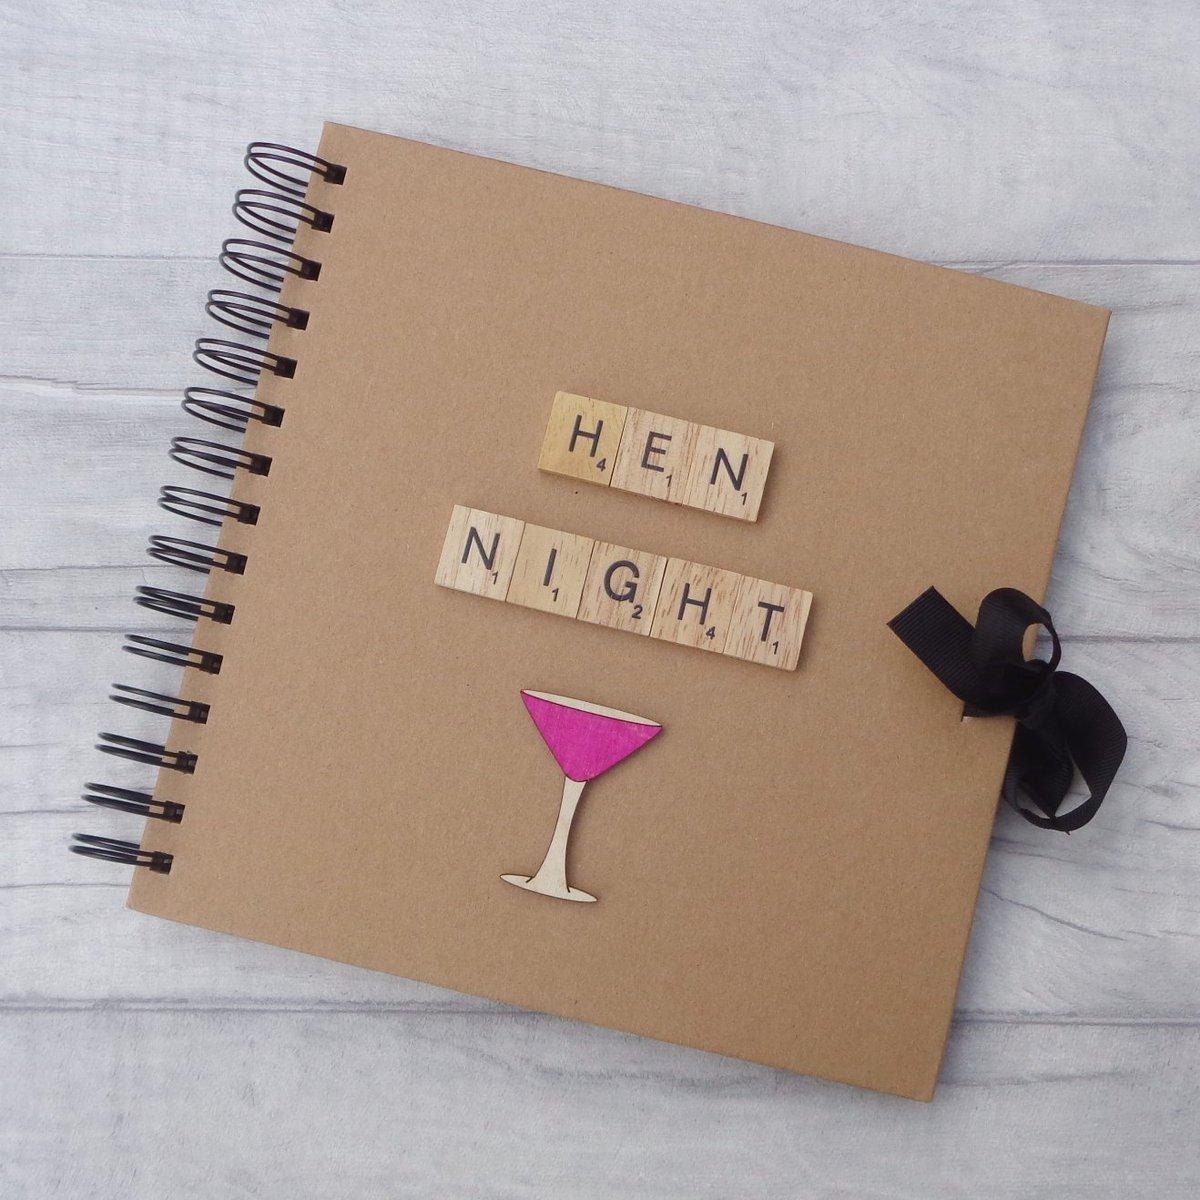 Hen Night album makes a lovely souvenir #weddingWednesday   http://www. etsy.com/uk/listing/490 061318/hen-night-party-album-bride-photo-book &nbsp; …  #HandmadeHour #gloshour #craftbuzz #mnukteam #onlinecraft<br>http://pic.twitter.com/QlzQhSRii1